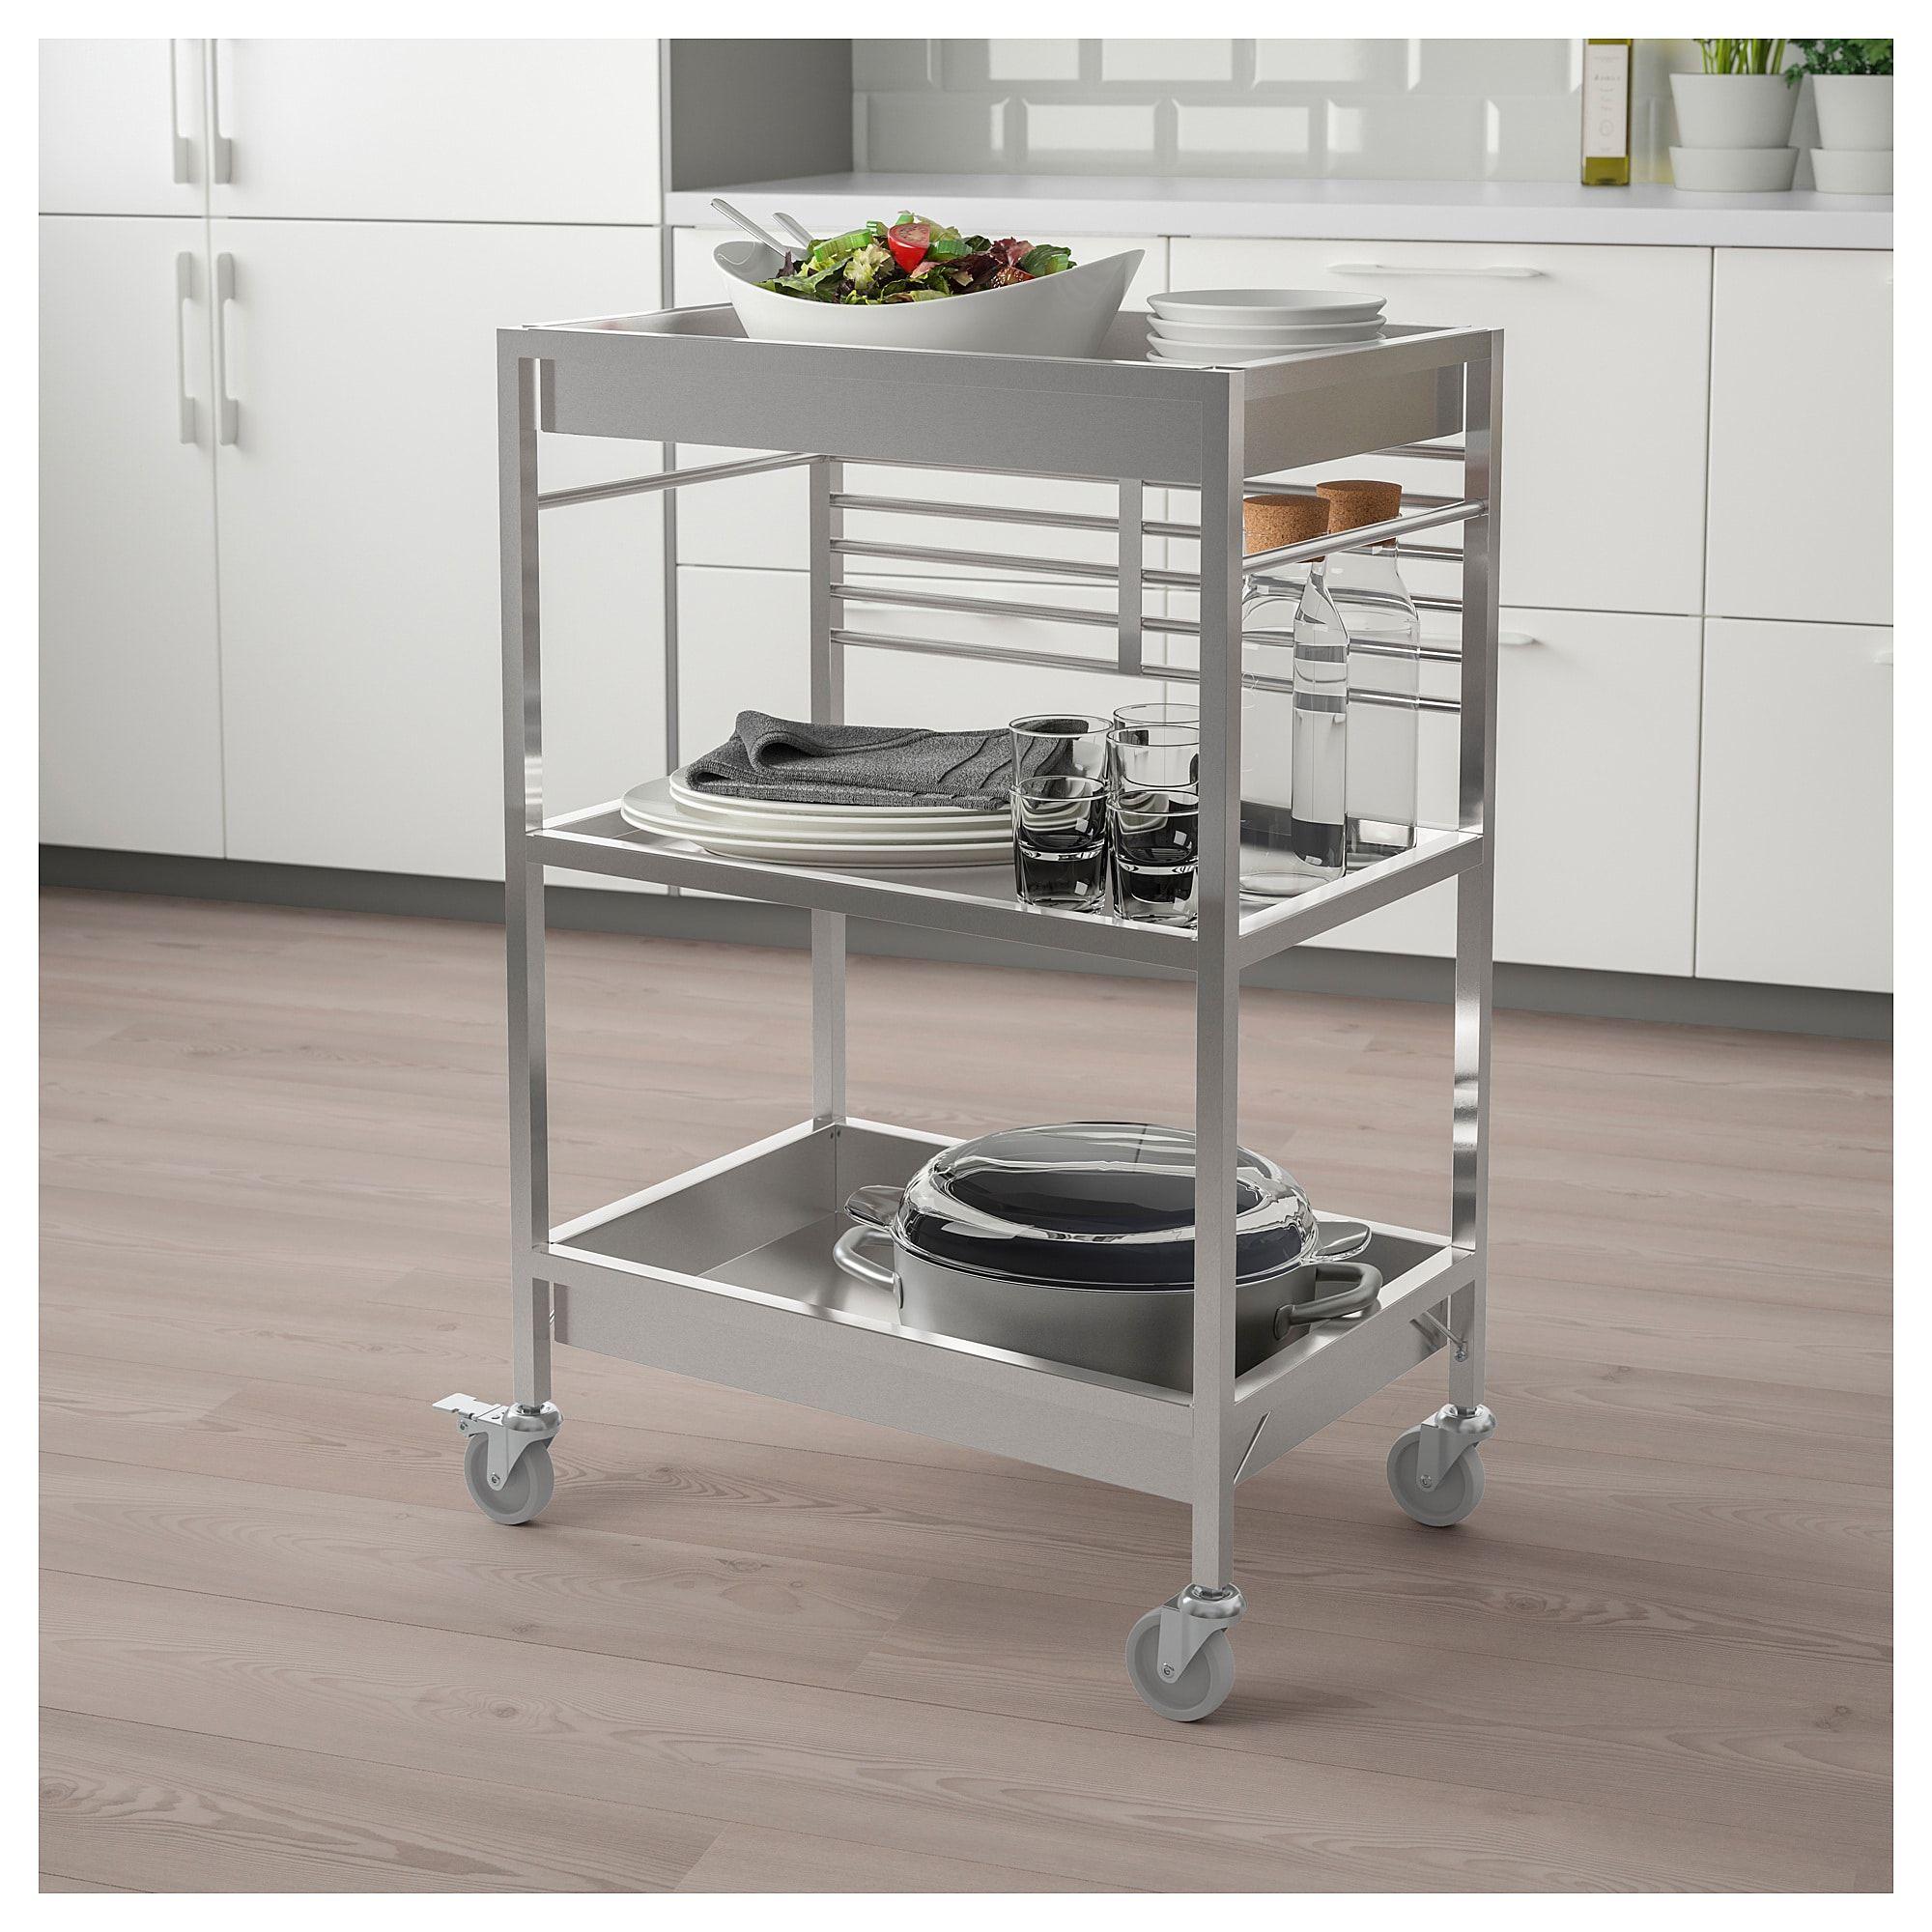 Ikea Kungsfors Stainless Steel Kitchen Cart Kitchen In